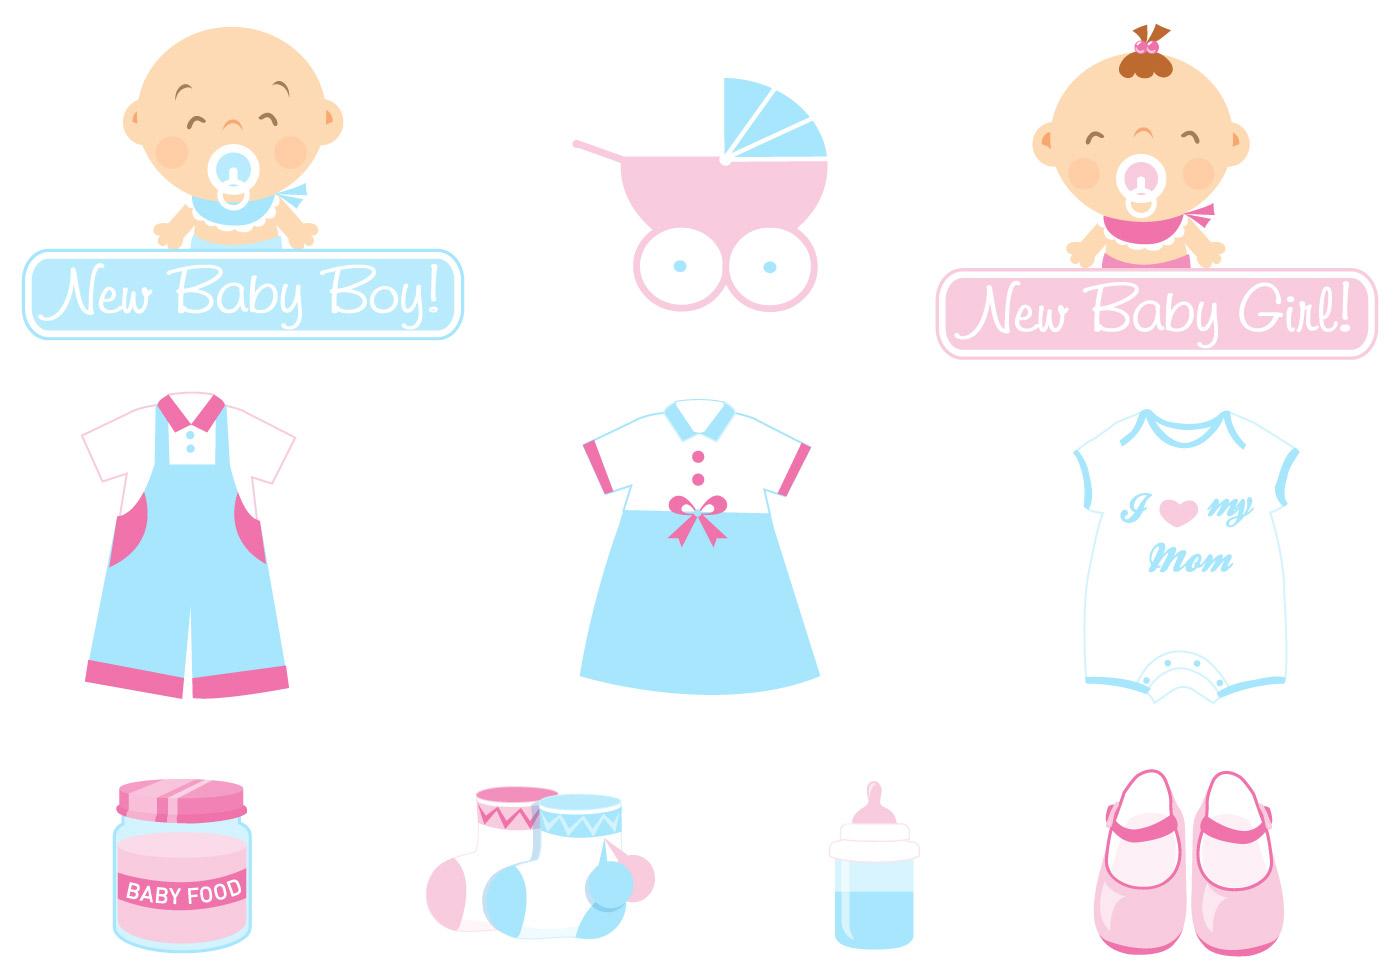 Baby-Symbol-Pinsel-Pack - Kostenlose Photoshop-Pinsel bei Brusheezy!